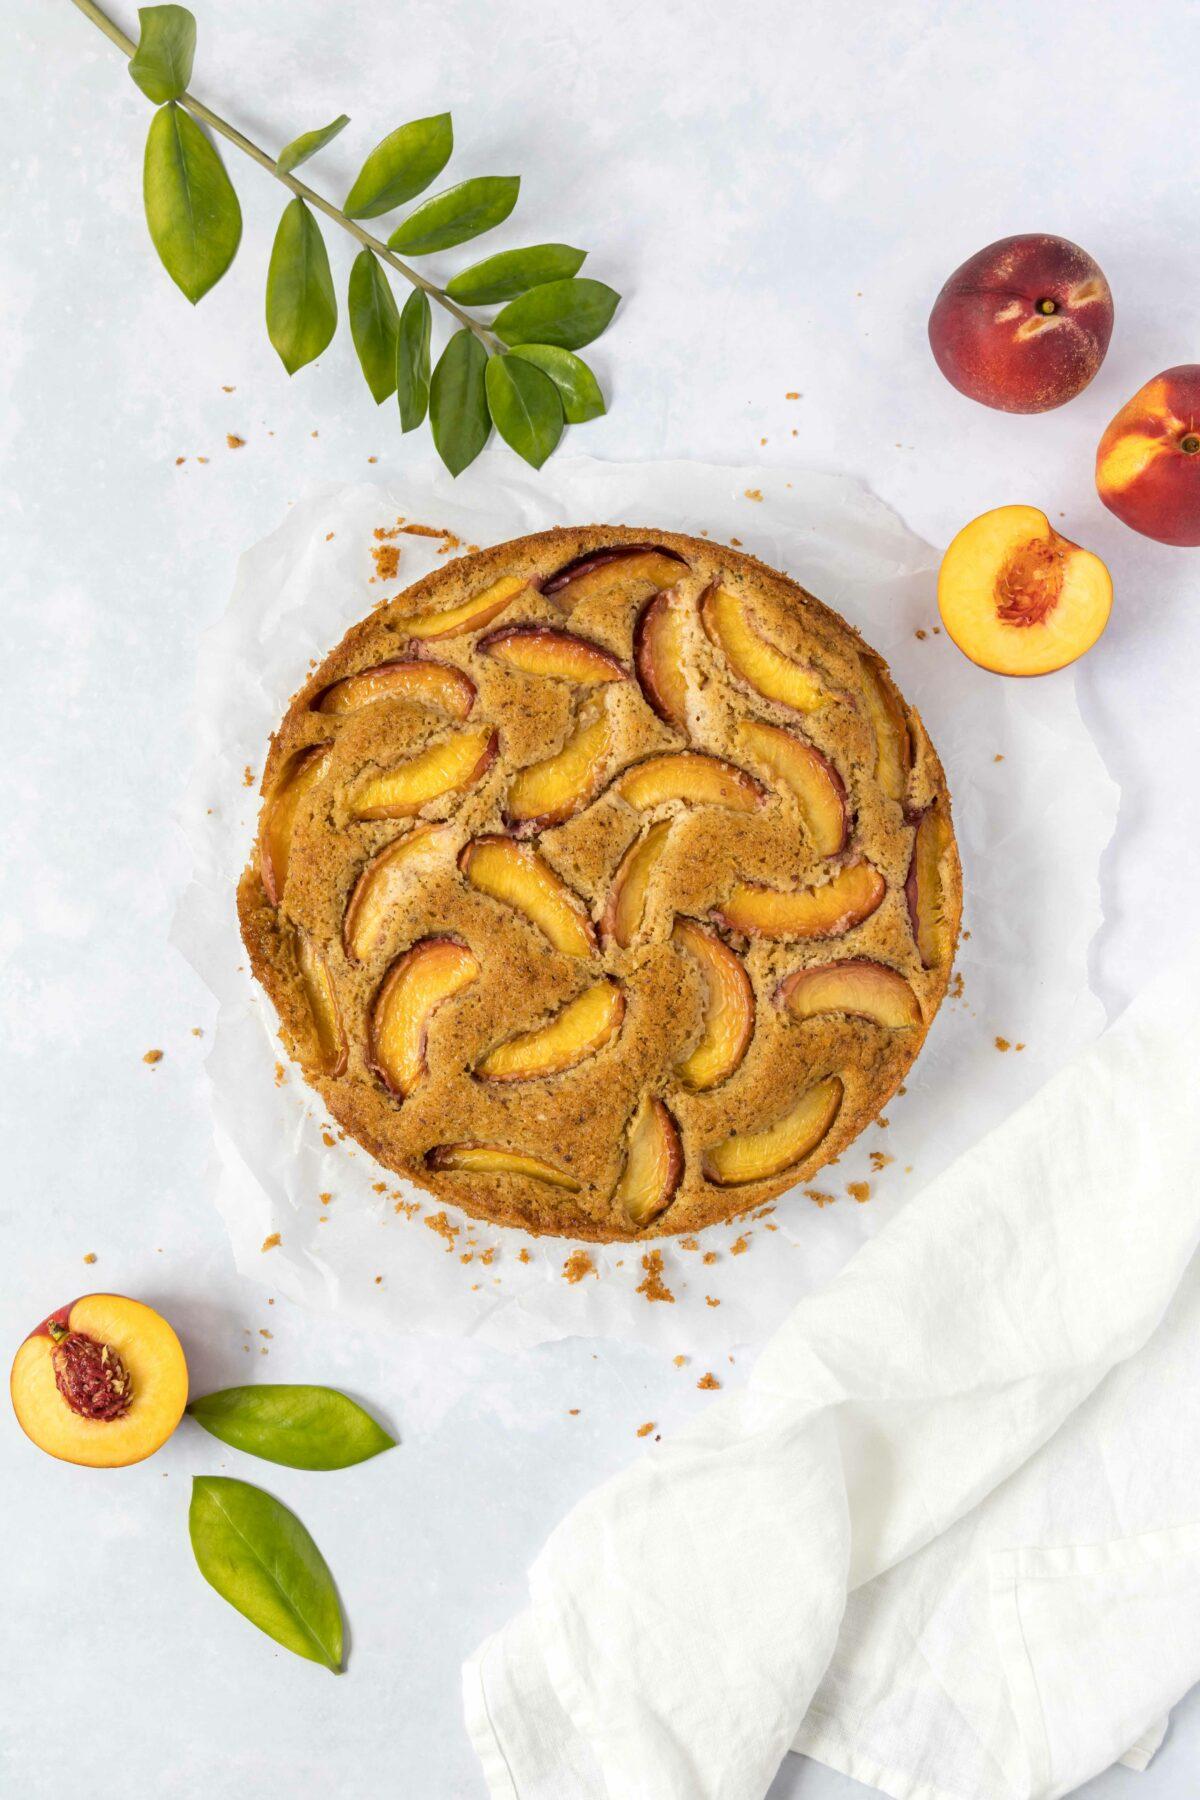 Nektarinen Haselnuss Kuchen / Nectarine and hazelnut cake by https://babyrockmyday.com/nektarinen-haselnuss-kuchen/